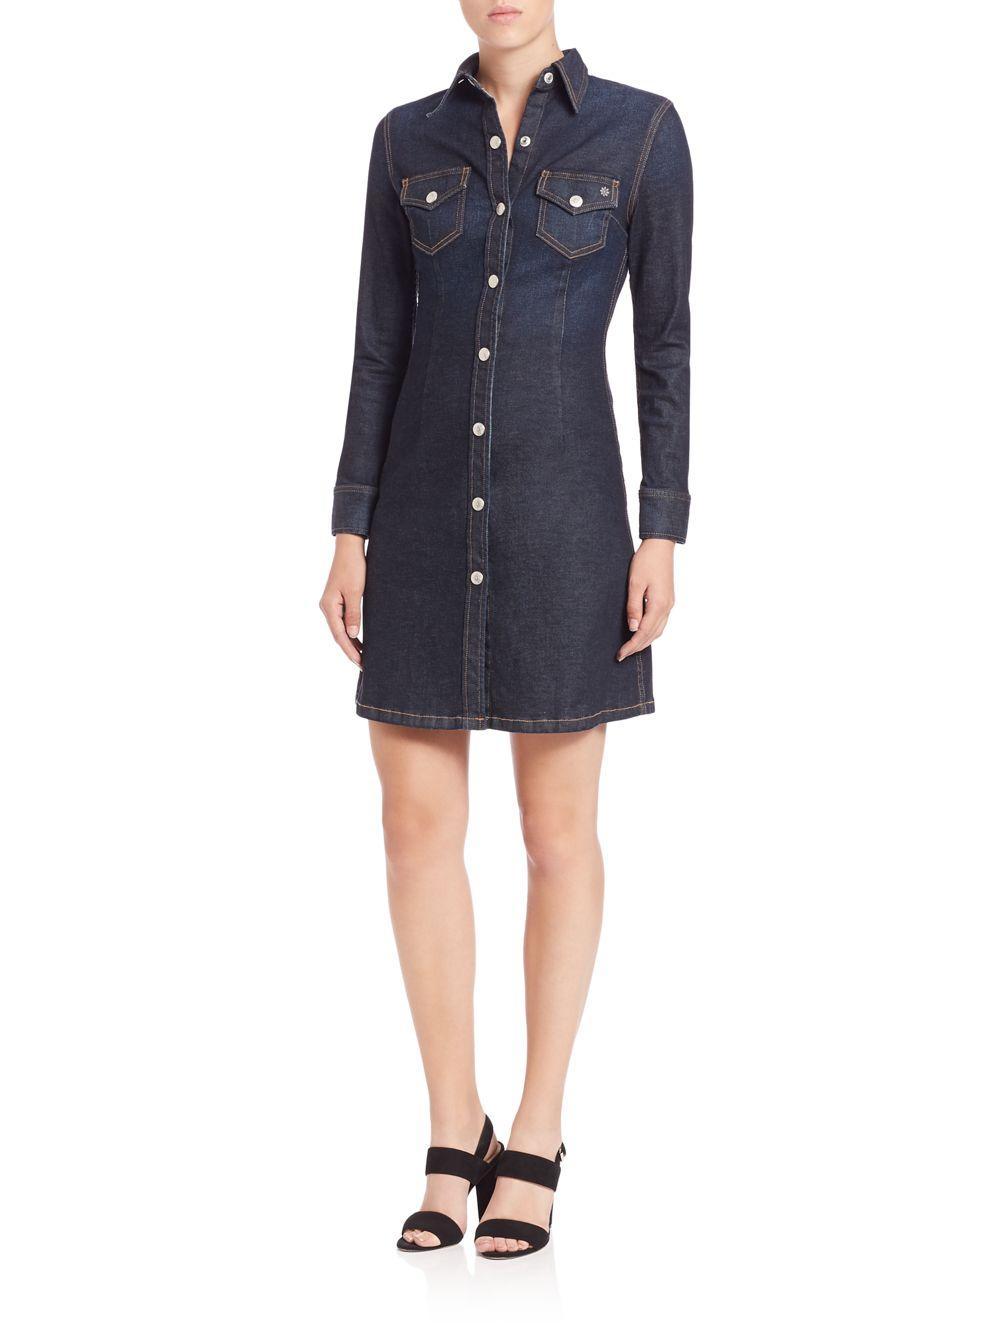 6f2fbf98b5 Lyst - AG Jeans Alexa Chung For Ag The Pixie Denim Mini Dress in Blue